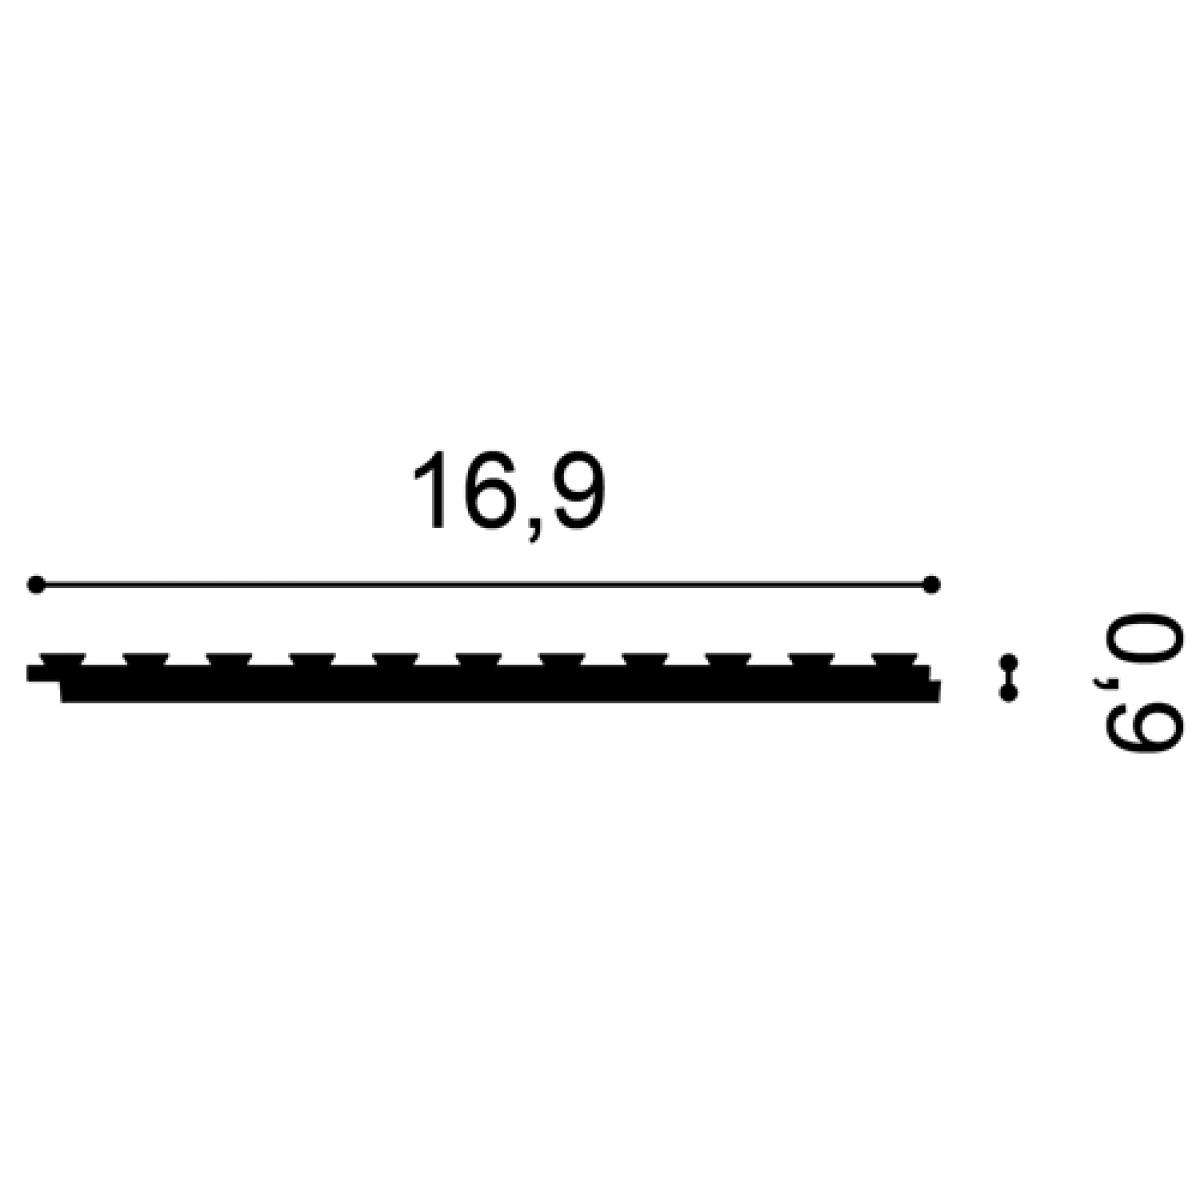 Brau Axxent PX147, Dimensiuni: 200 X 16.9 X 9.5 cm, Orac Decor